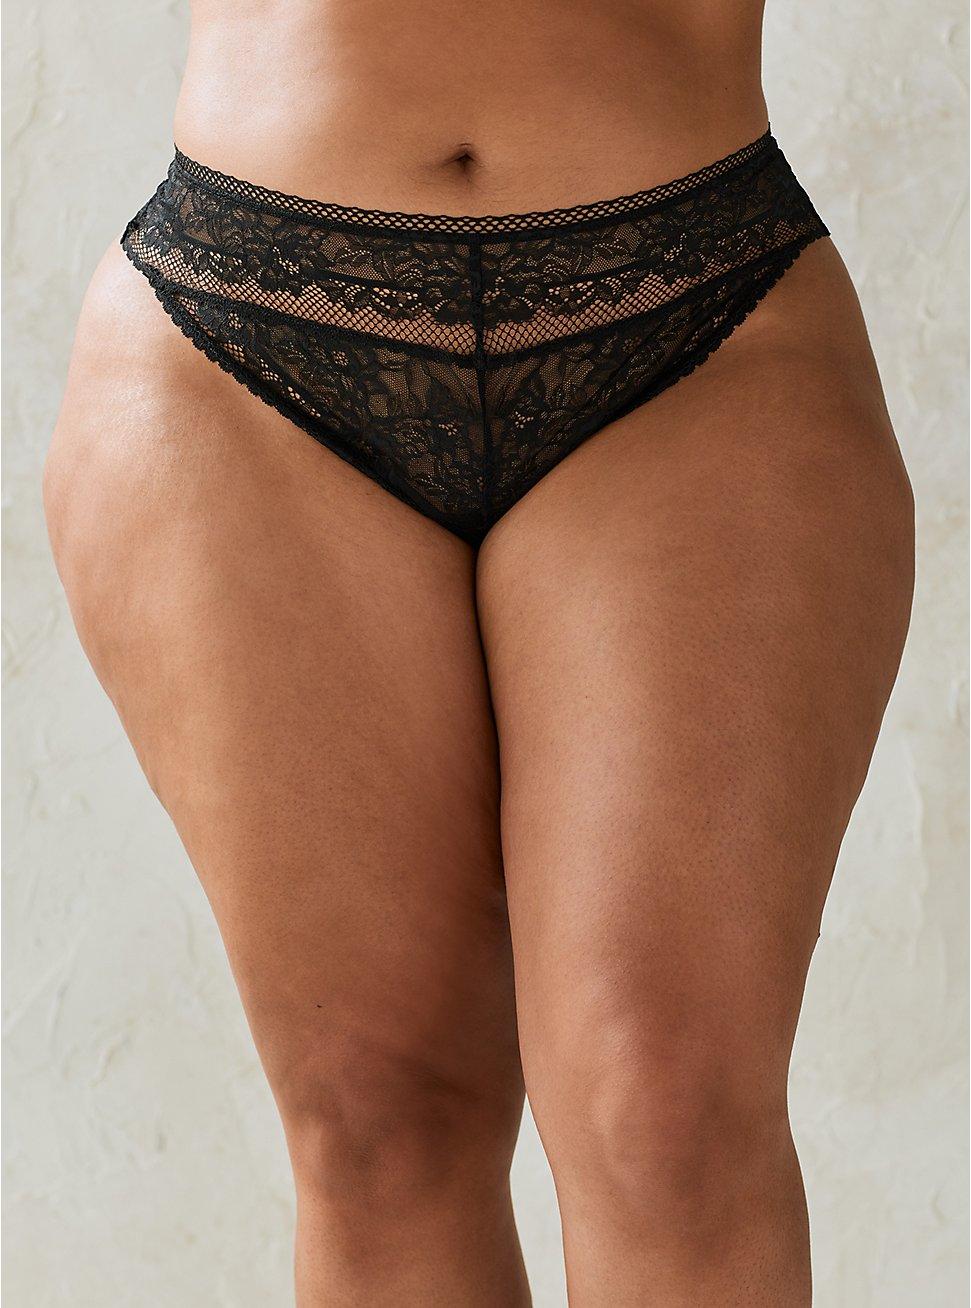 Thong Panty - Lace Black, RICH BLACK, hi-res